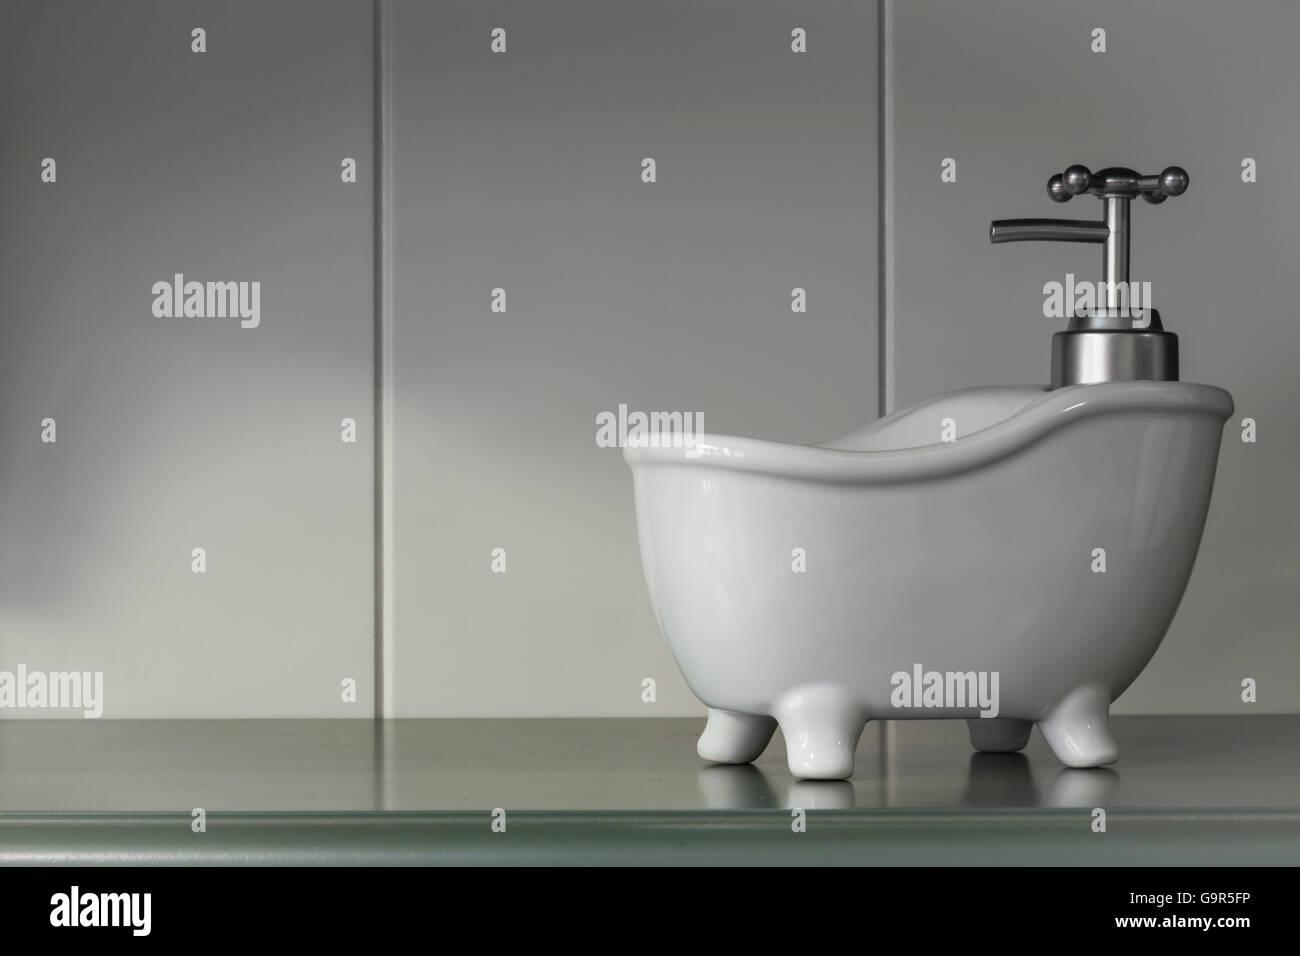 Vasche Da Bagno Vintage : Vasca da bagno vintage prezzo vasca da bagno home interior idee